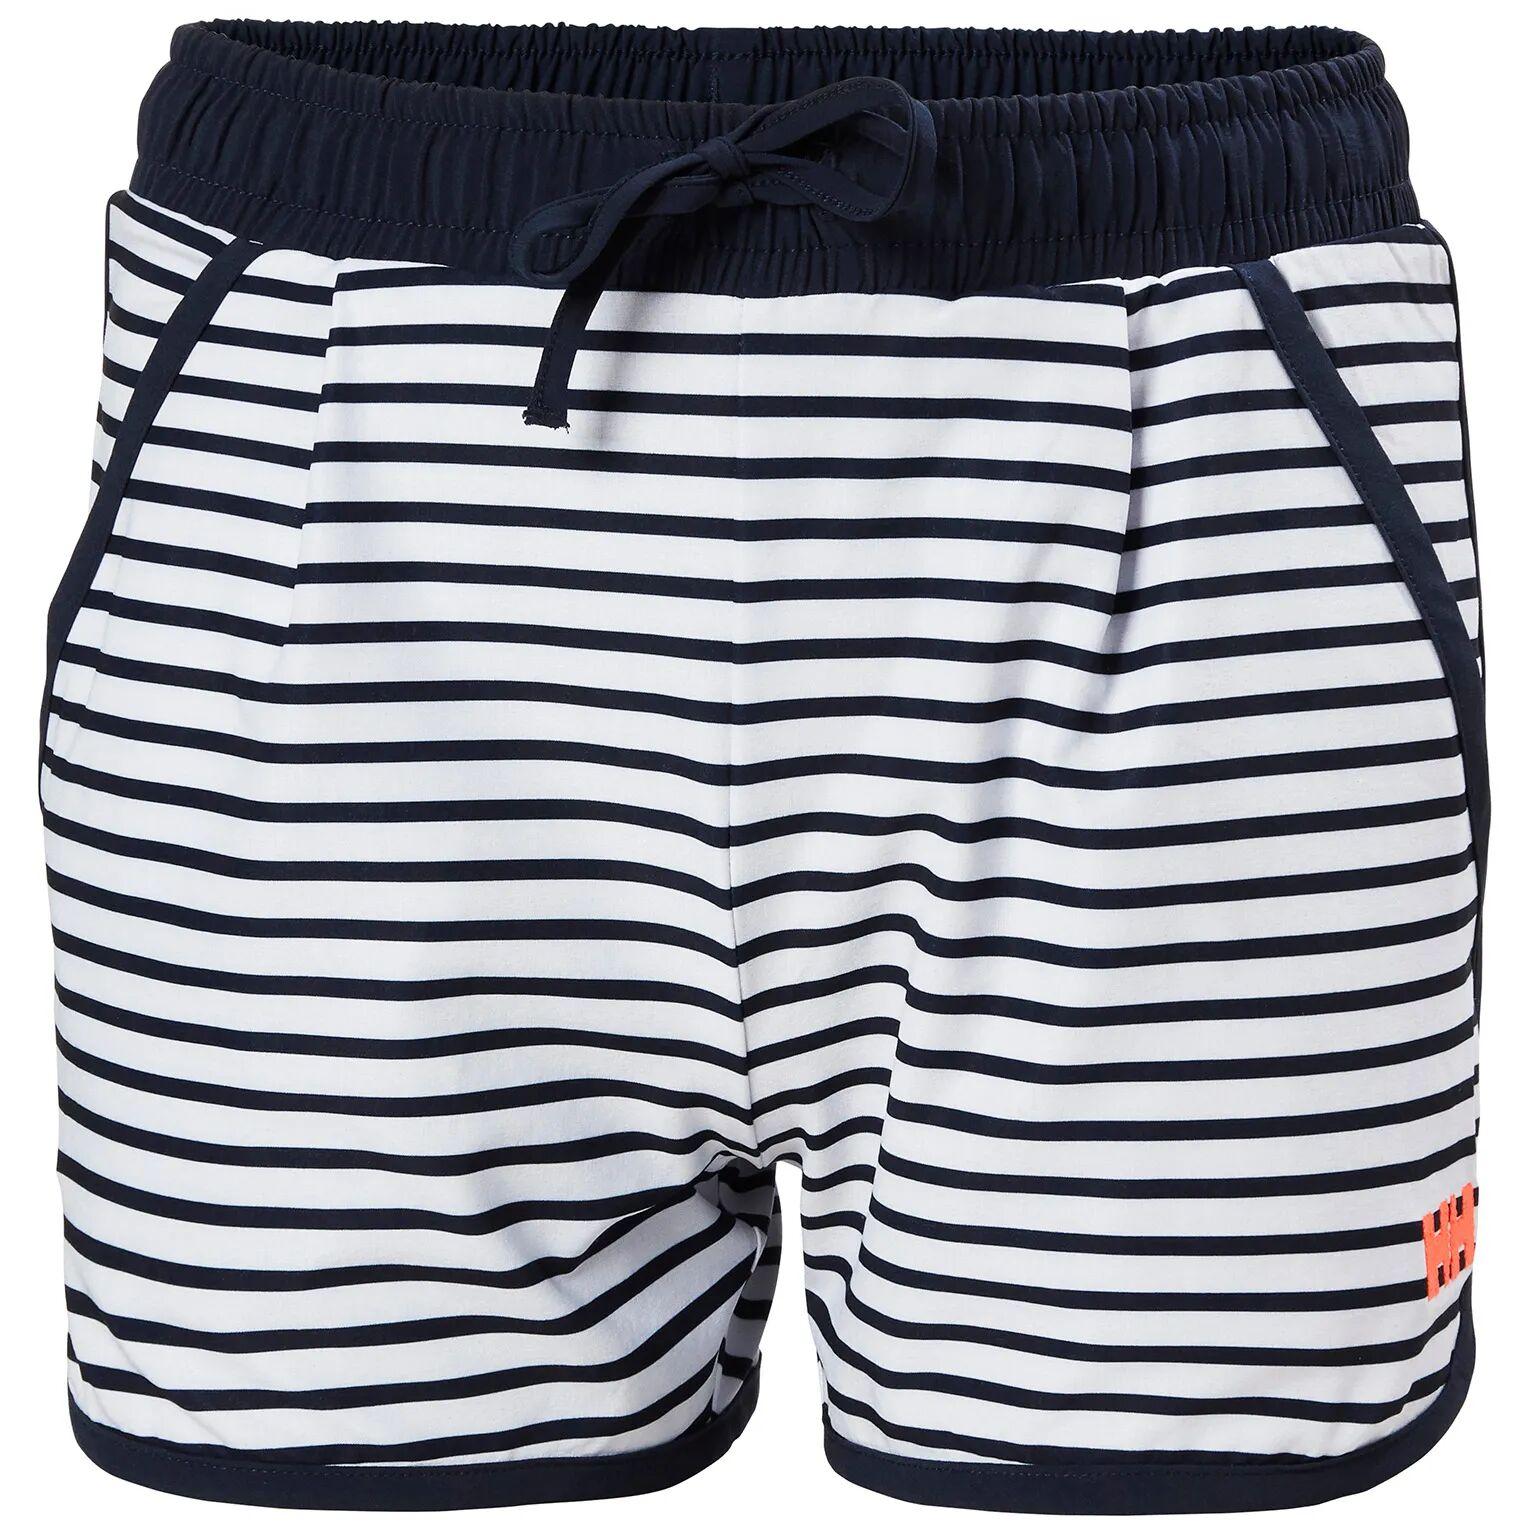 Helly Hansen Kids Pantalon De Voile Bleu Marine 152/12